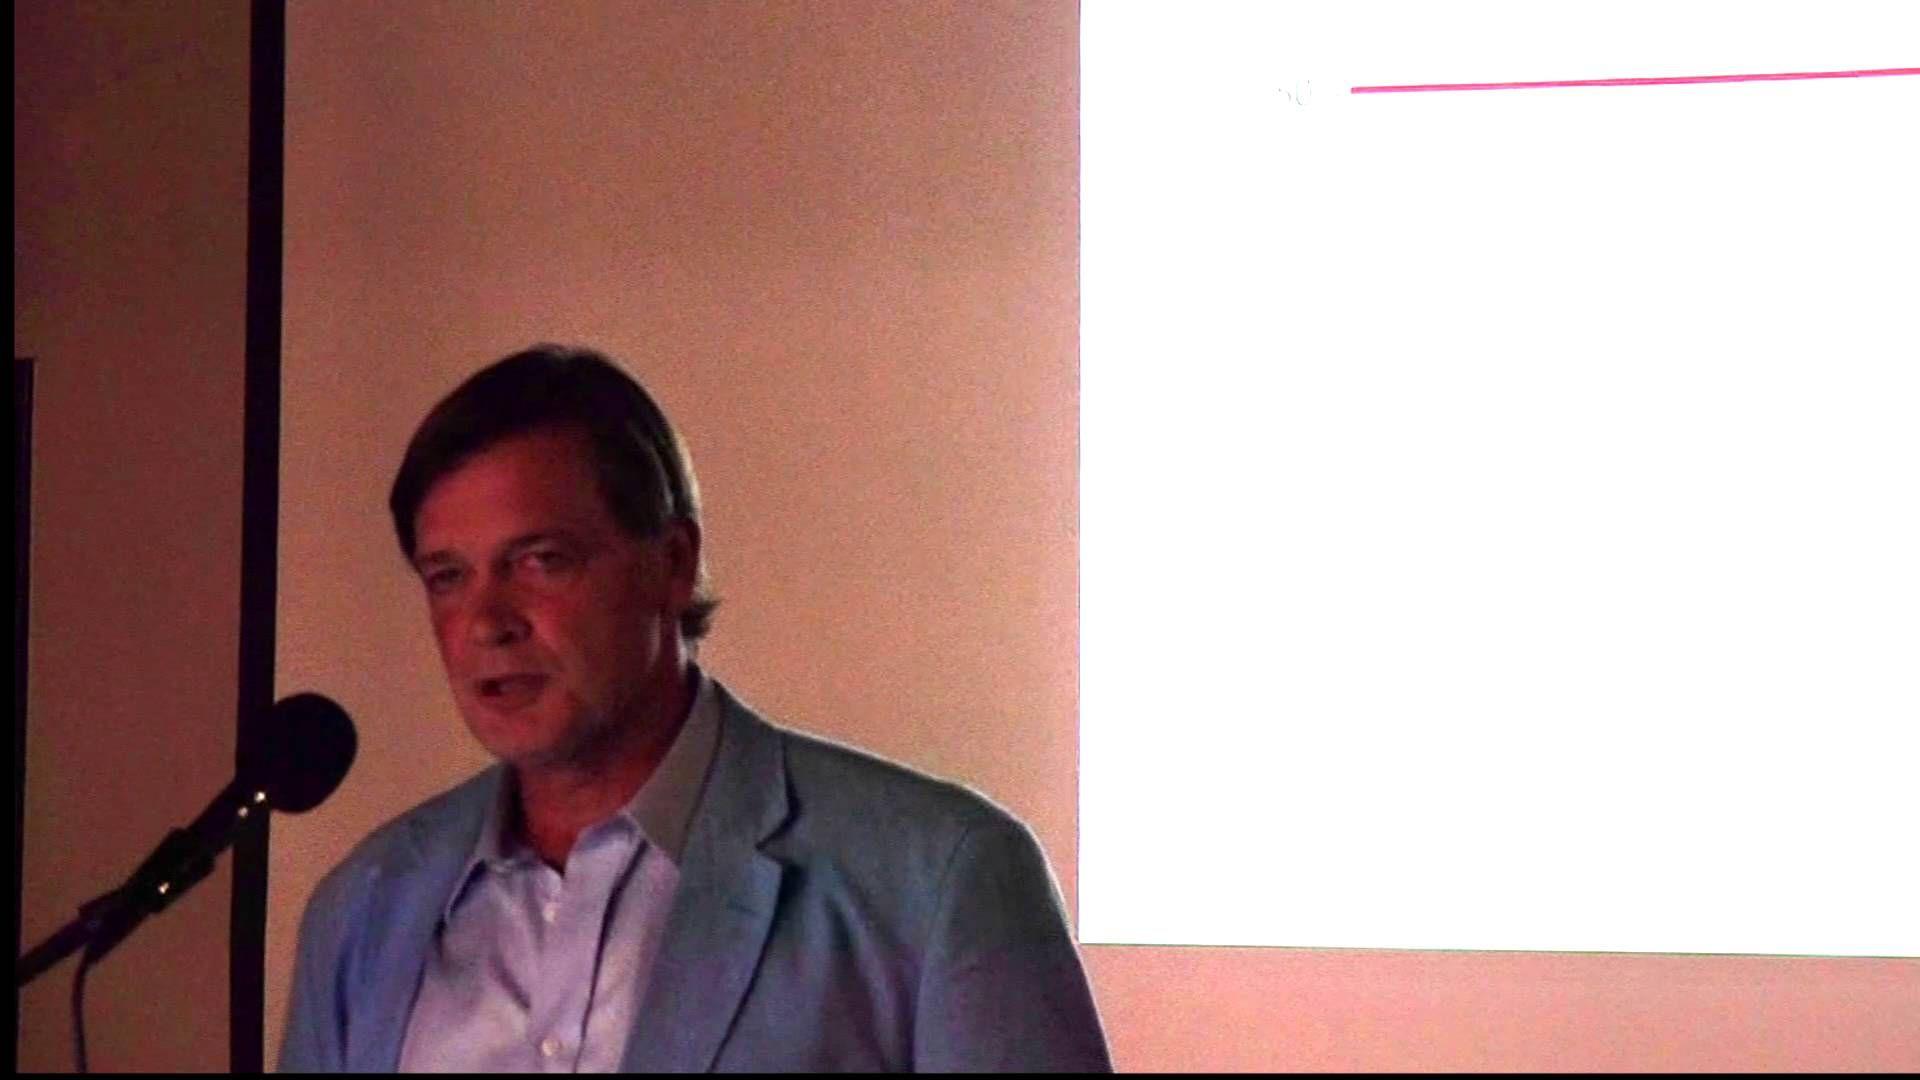 Dr. Wakefield, October 2nd 2015, Salt Lake City Santé